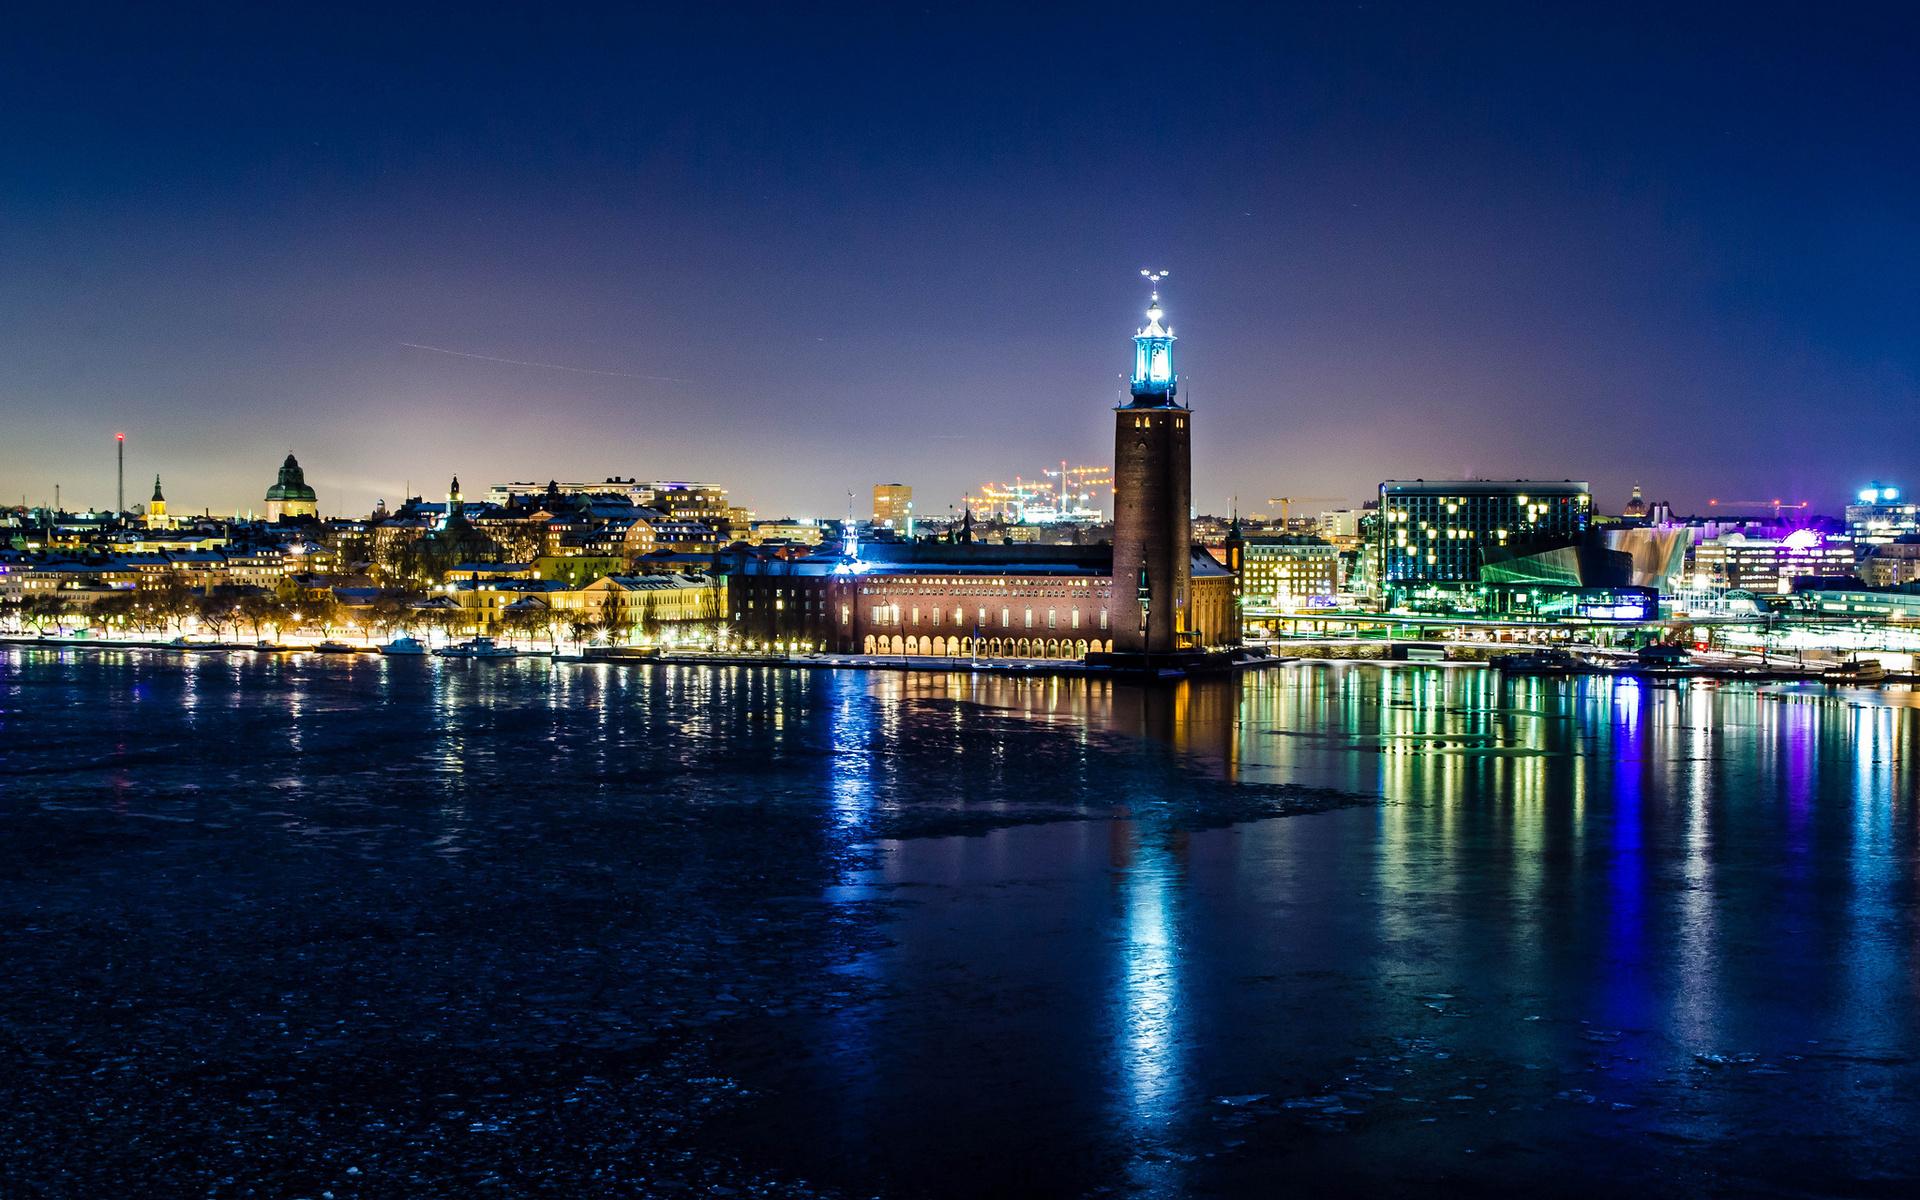 gratis dejtingsajt bangkok stockholm